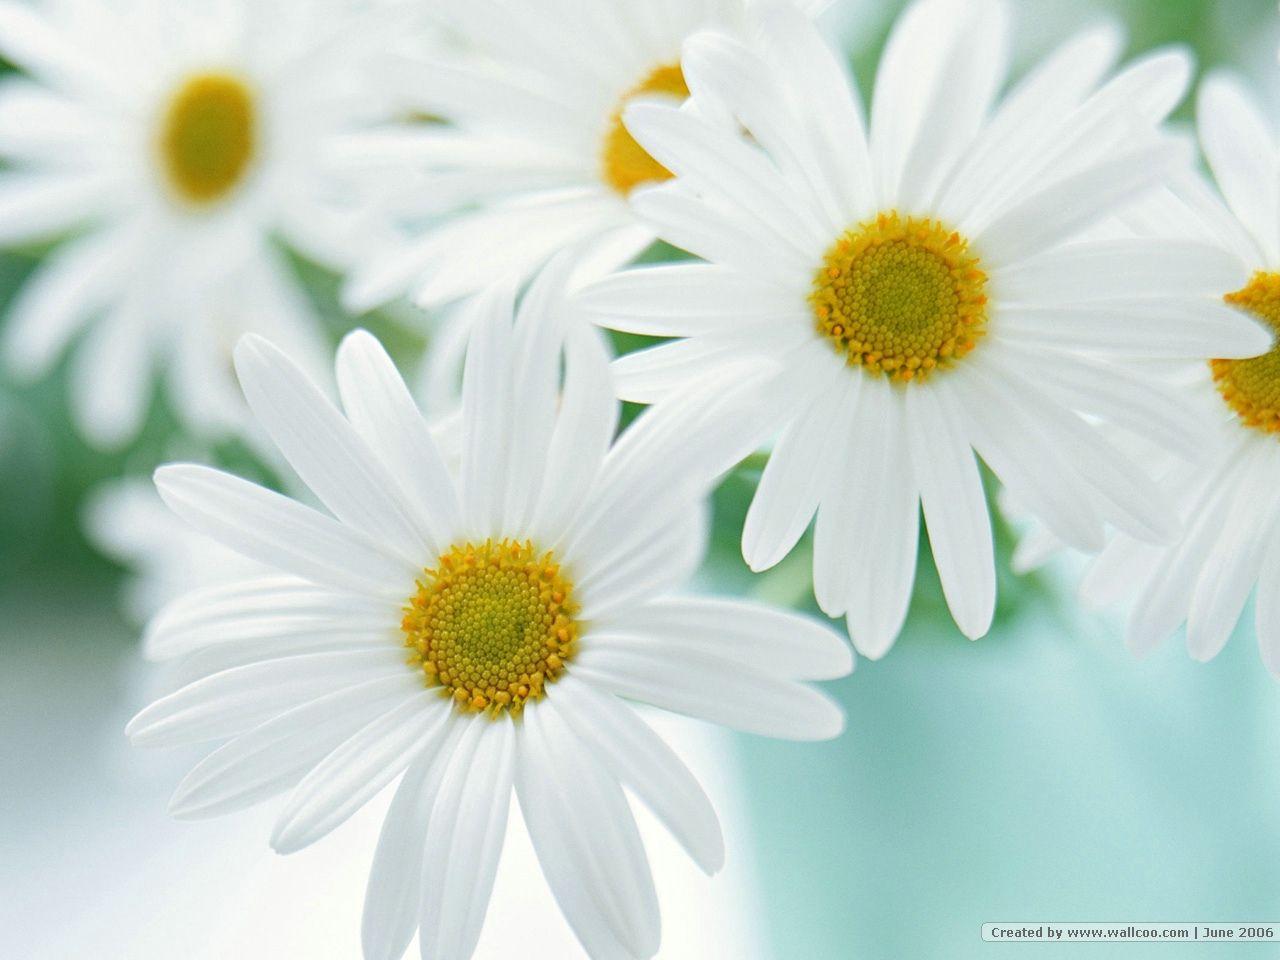 fond_ecran_fleur_06_1280x960